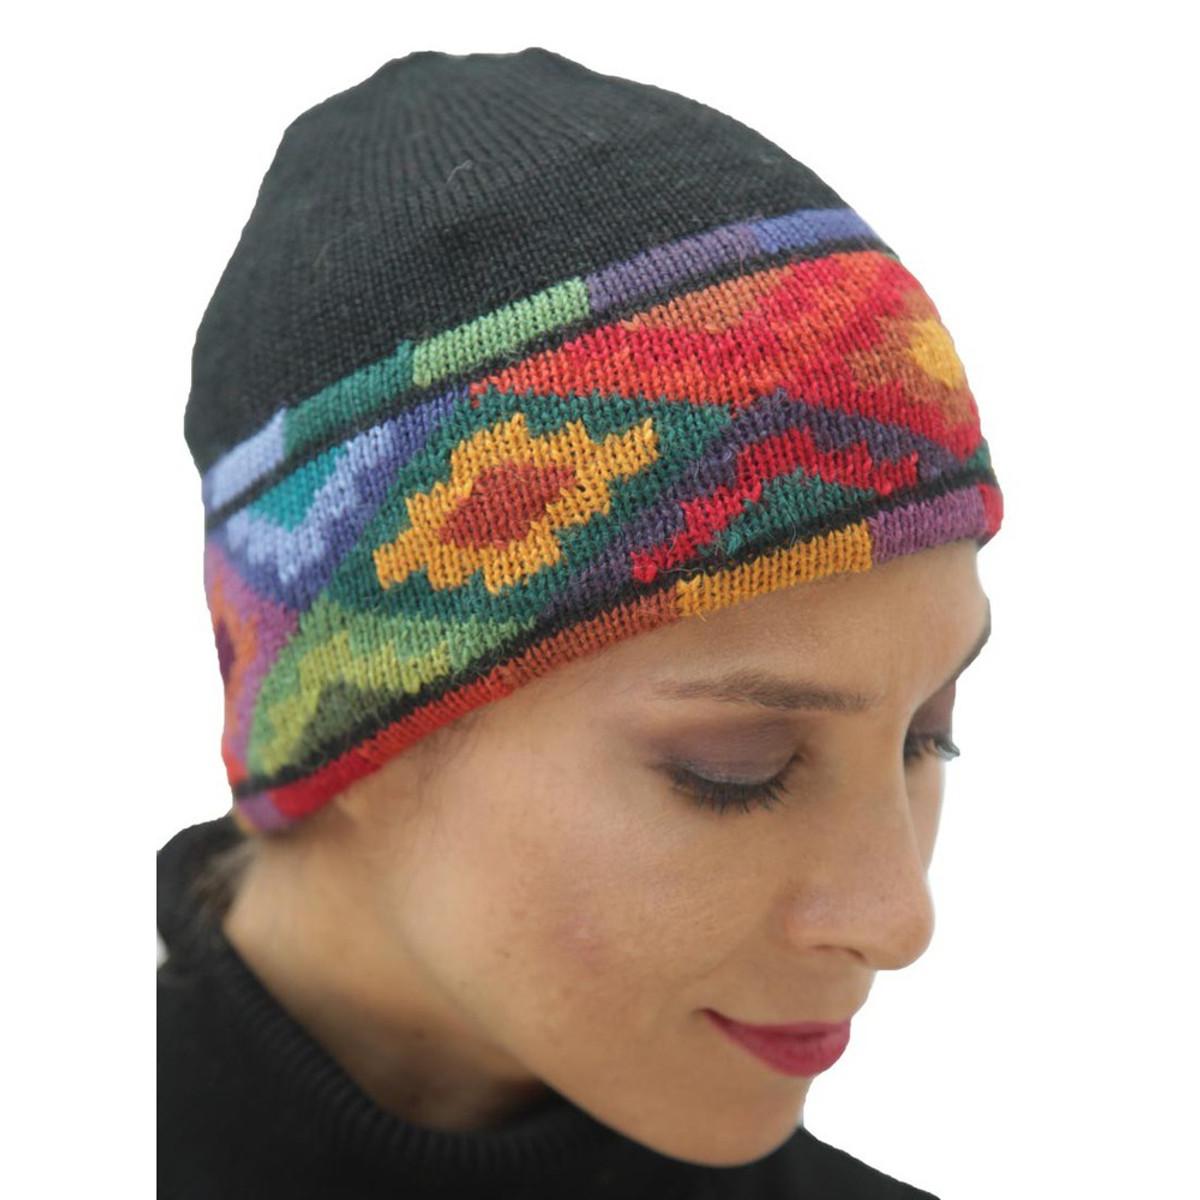 b9697667885 Superfine 100% Alpaca Wool Hand Knit Intarsia Beanie Hat One Size ...